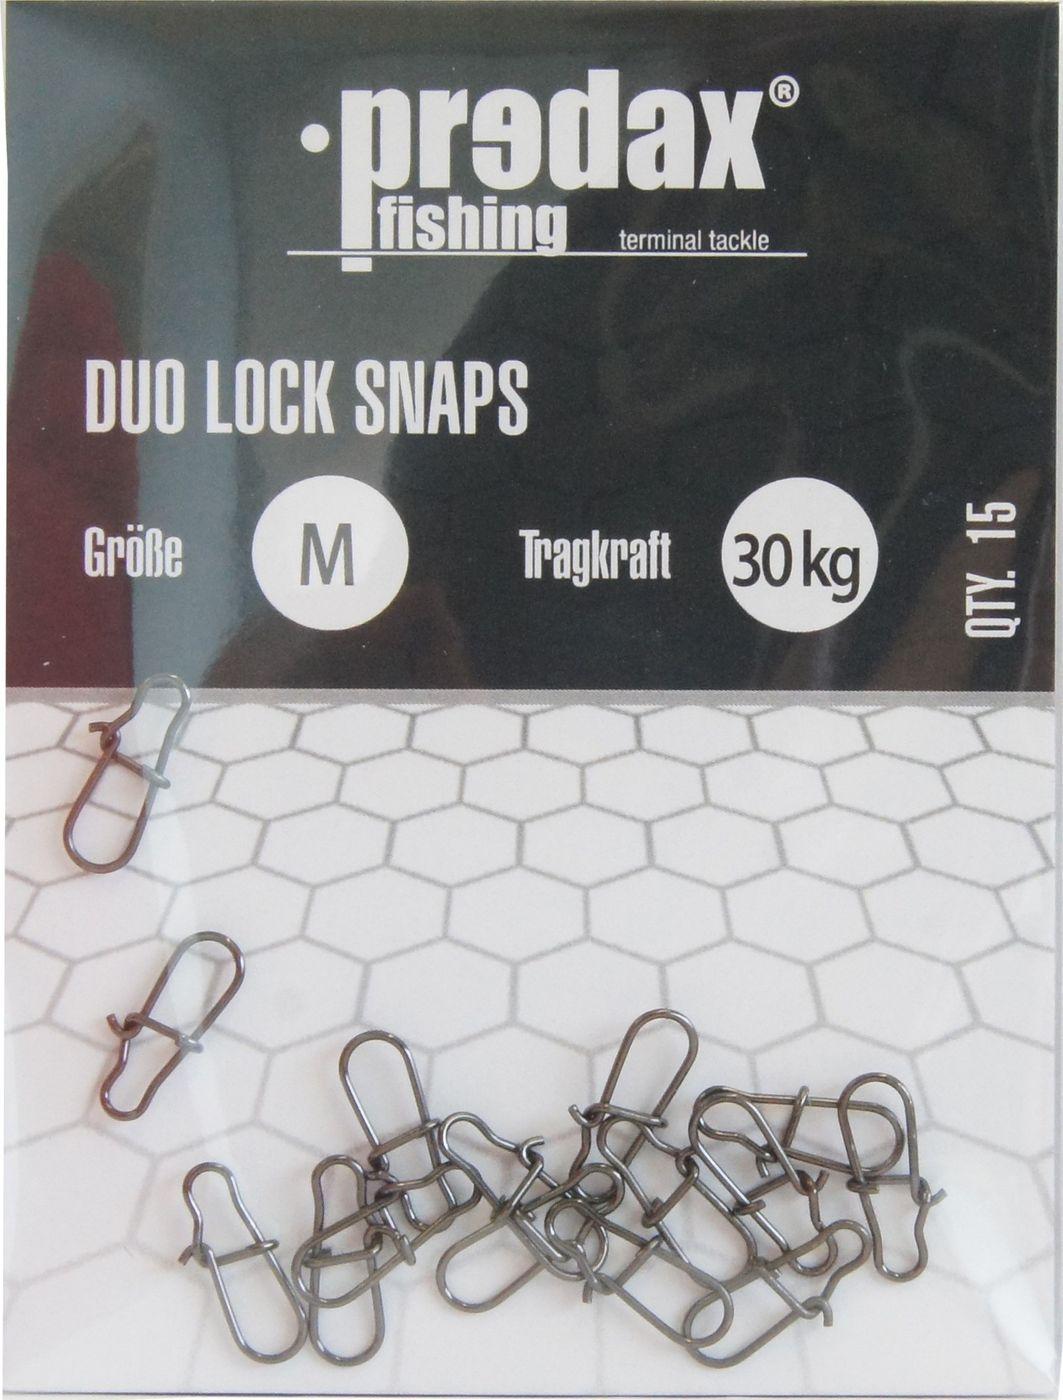 15 Stück Predax Duo Lock Snaps